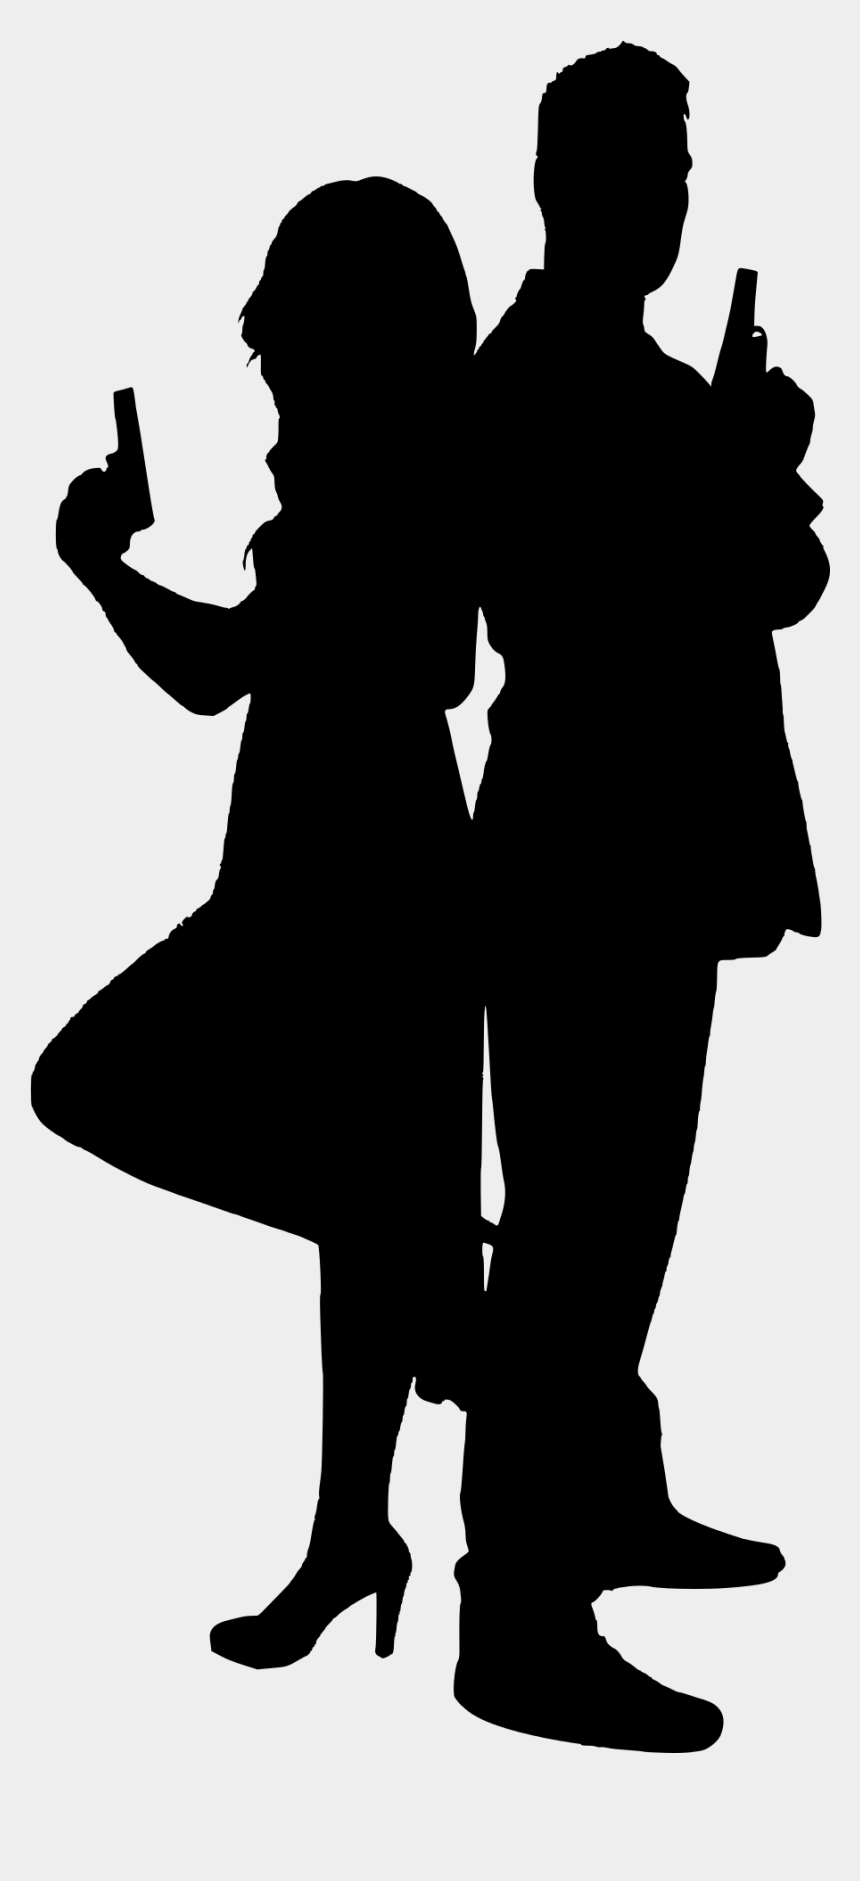 James Bond Silhouette Png Transparent Little Girl